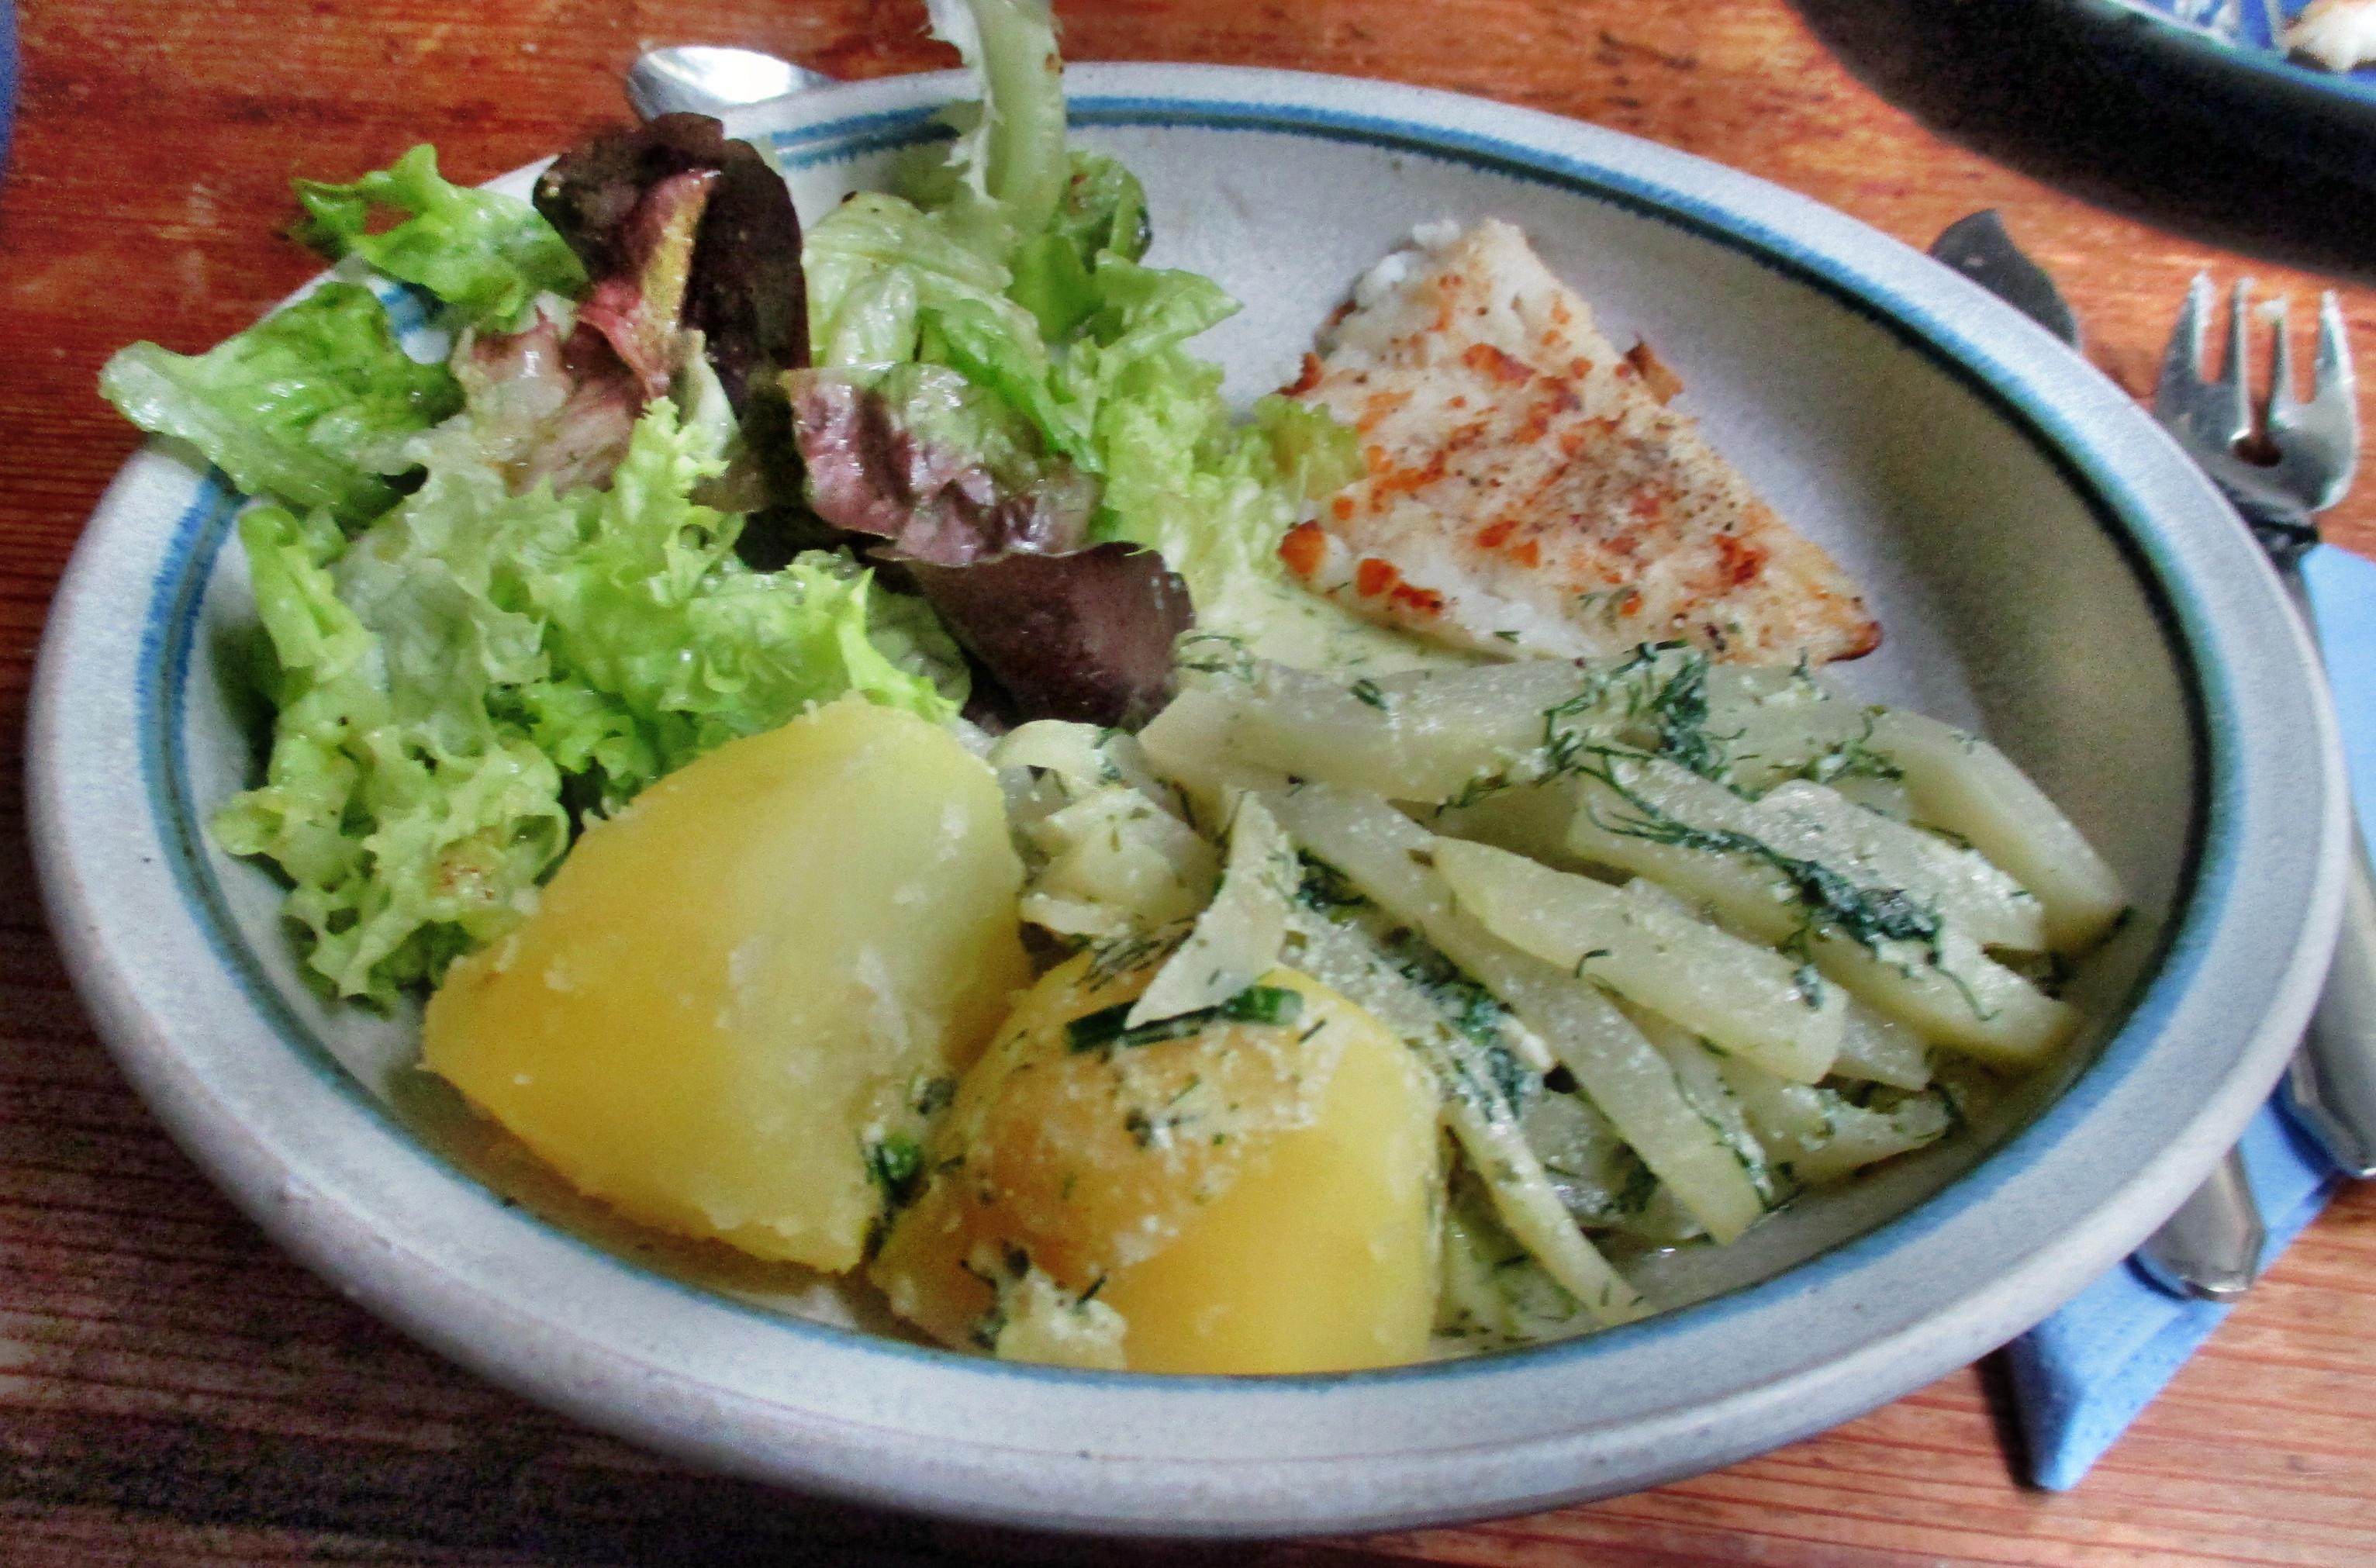 Kabeljau,Kohlrabigemüse,Salzkartoffeln,Salat -9.6.15   (9)